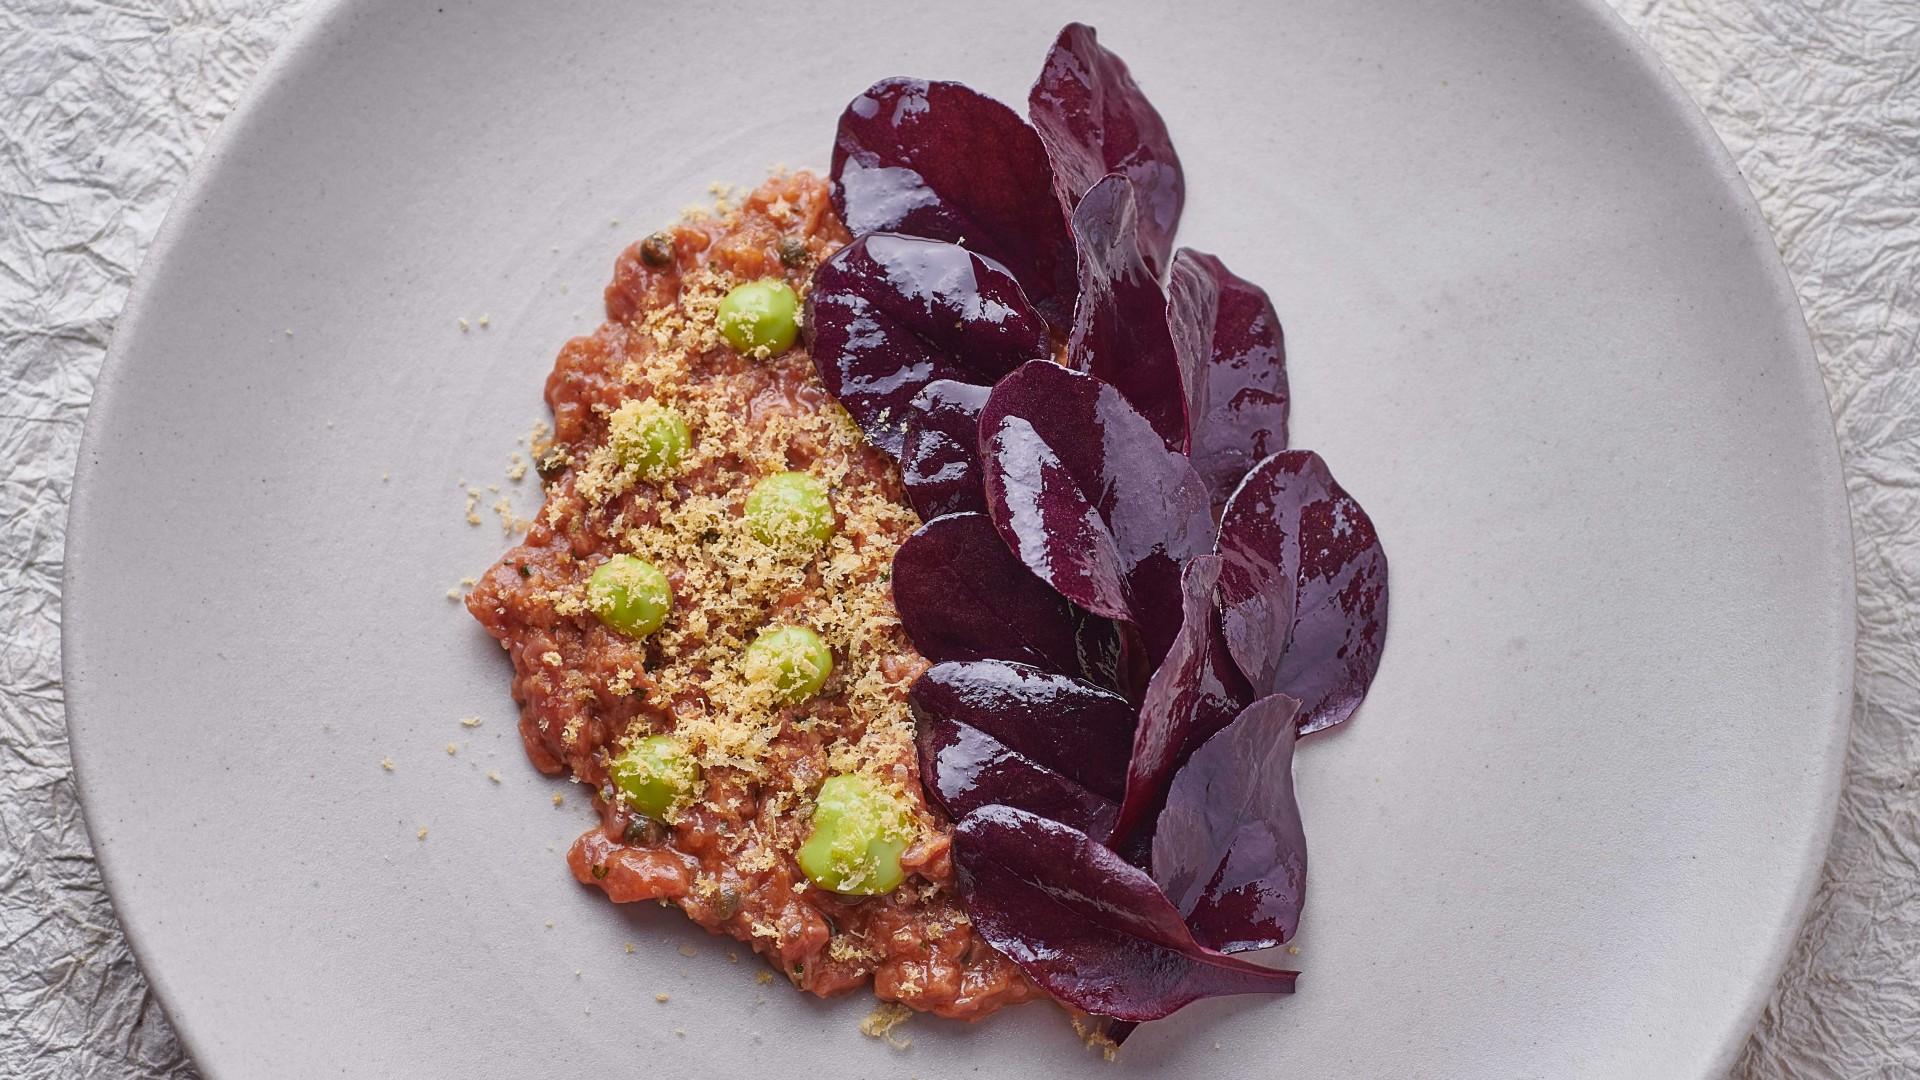 Spiced beef tartare, lovage, amaranth